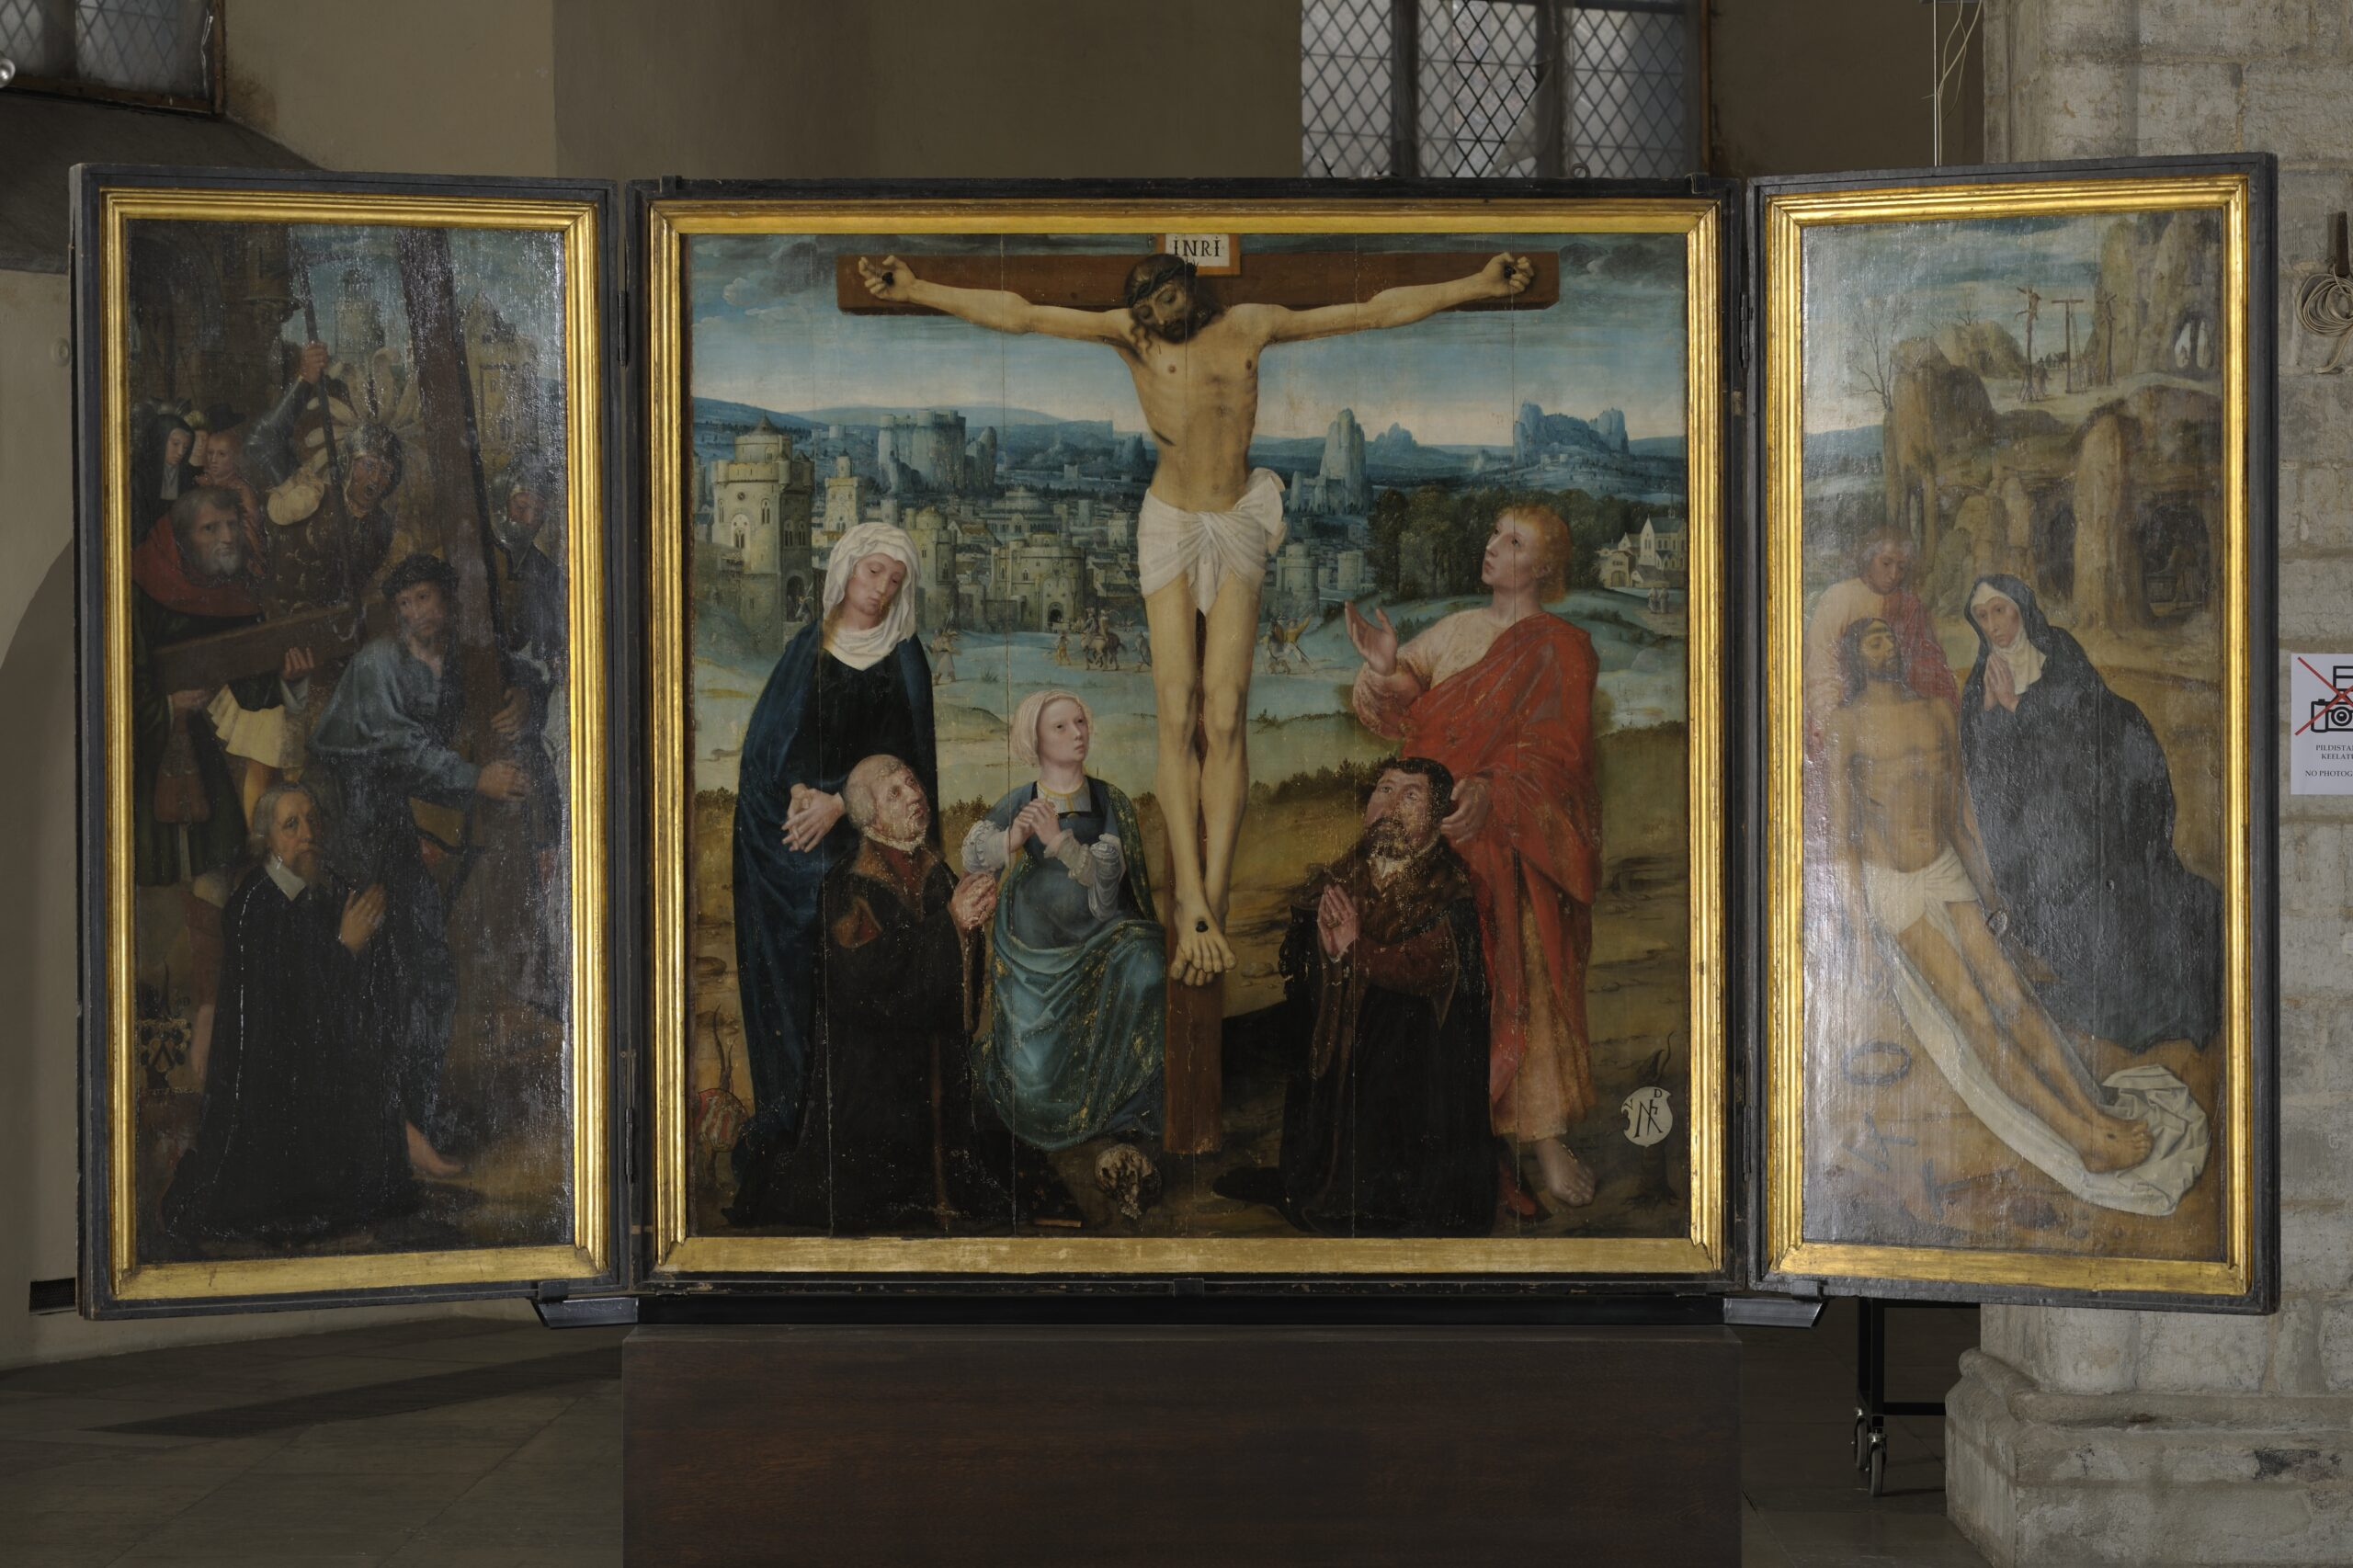 Workshop of the Bruges master Adriaen Isenbrandt, <em>The Passion Altarpiece</em>, ca. 1515-20<br>Art Museum of Estonia